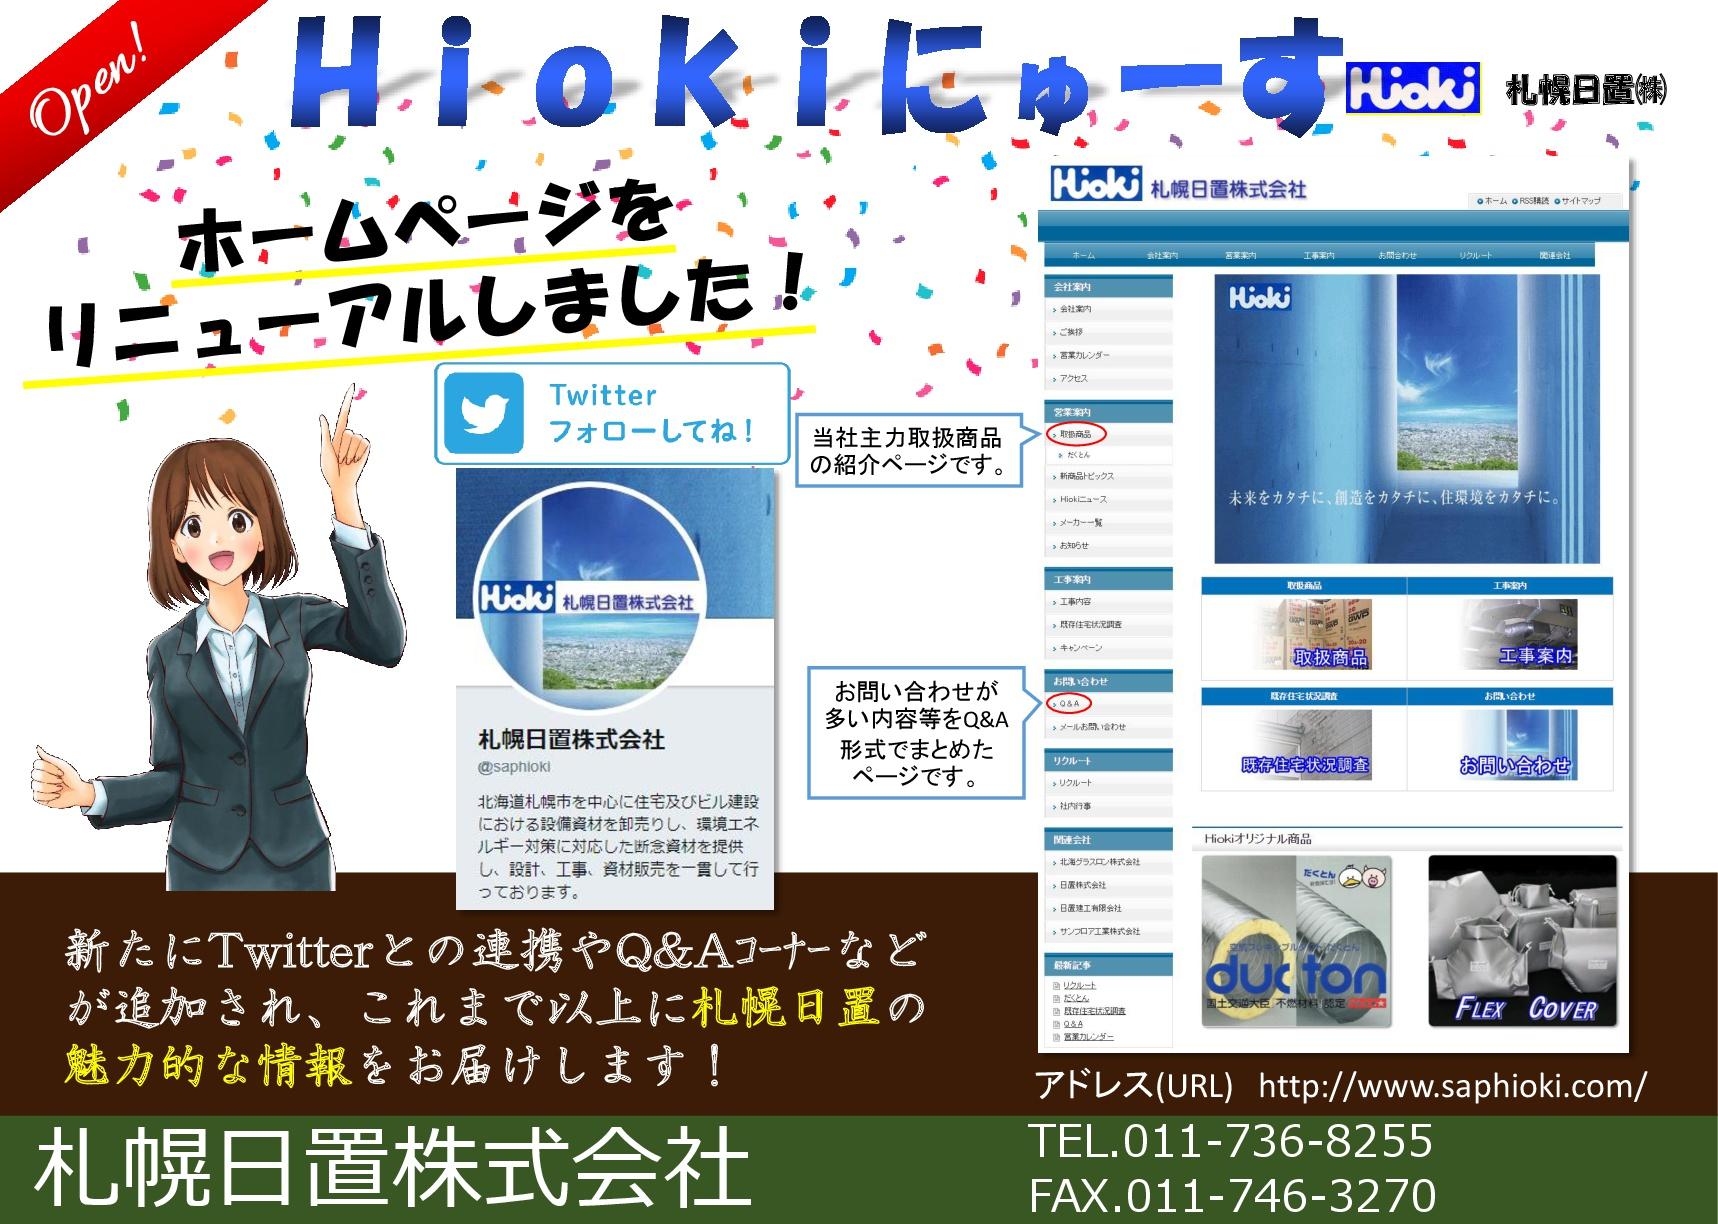 hiokiNEWSVol16-002.jpg